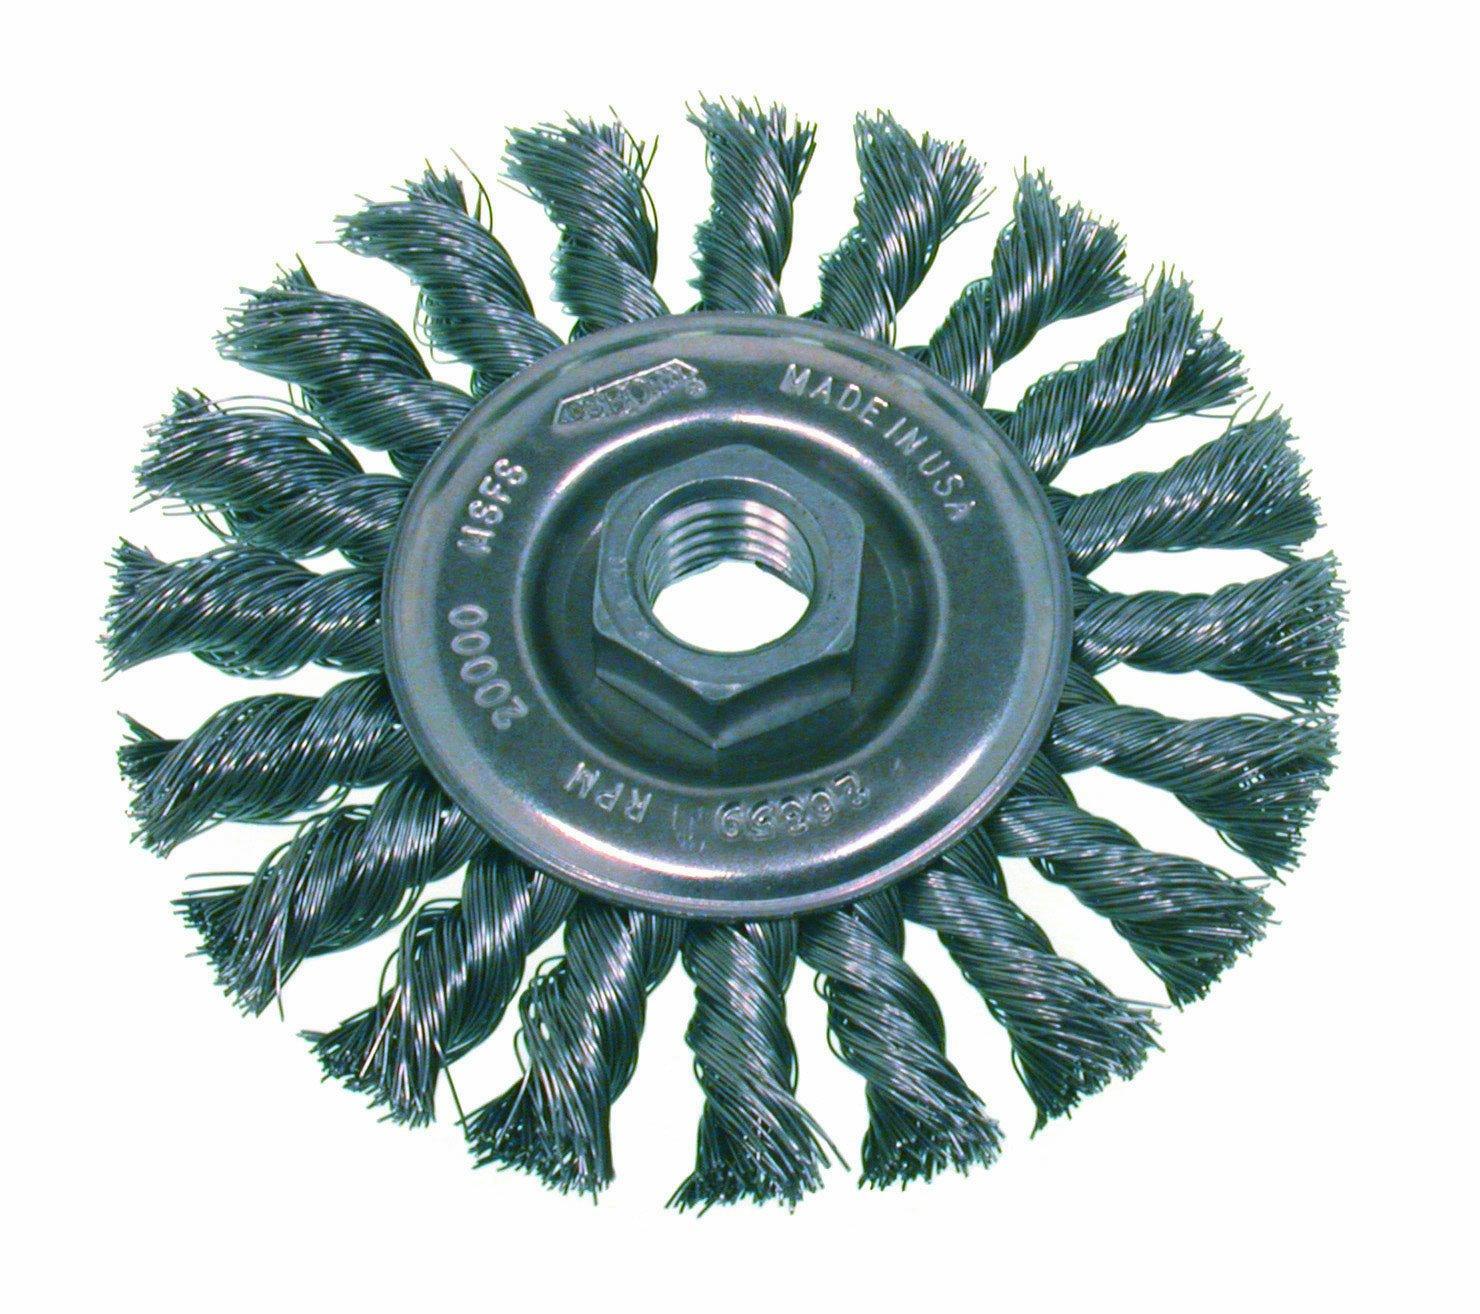 Osborn 26376 High Speed Small Grinder Standard Twist Knot Wire Wheel Brush, Stainless Steel Bristle, 20000 RPM, 4'' Diameter, 0.014'' Fill Diameter